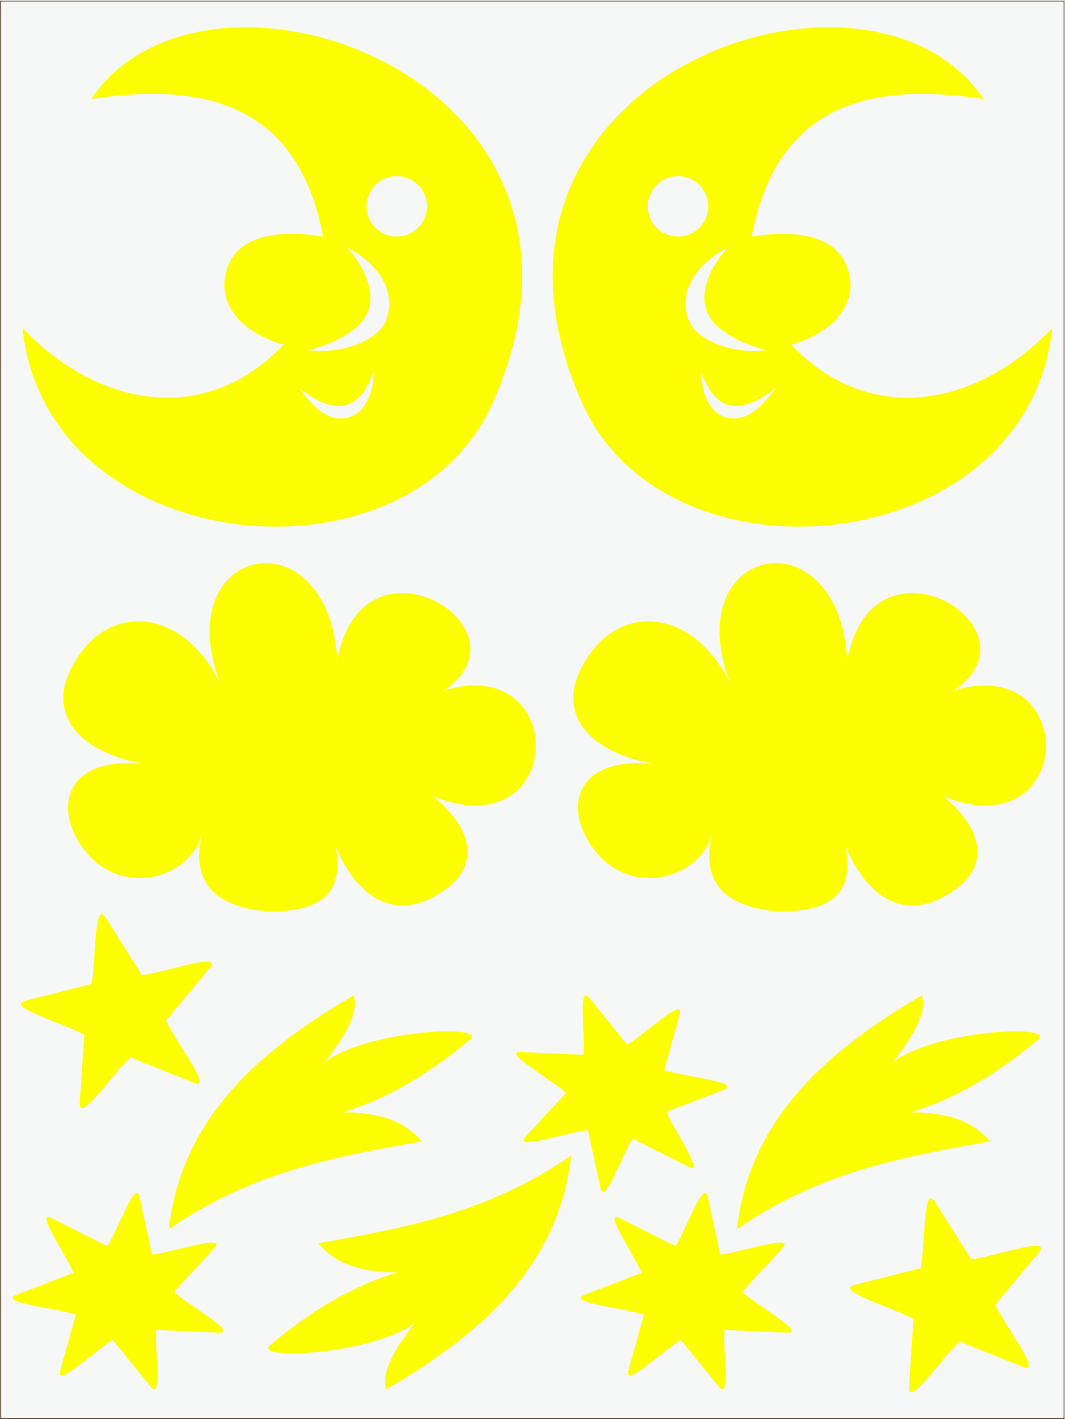 Mesiac a kométy neon žltý